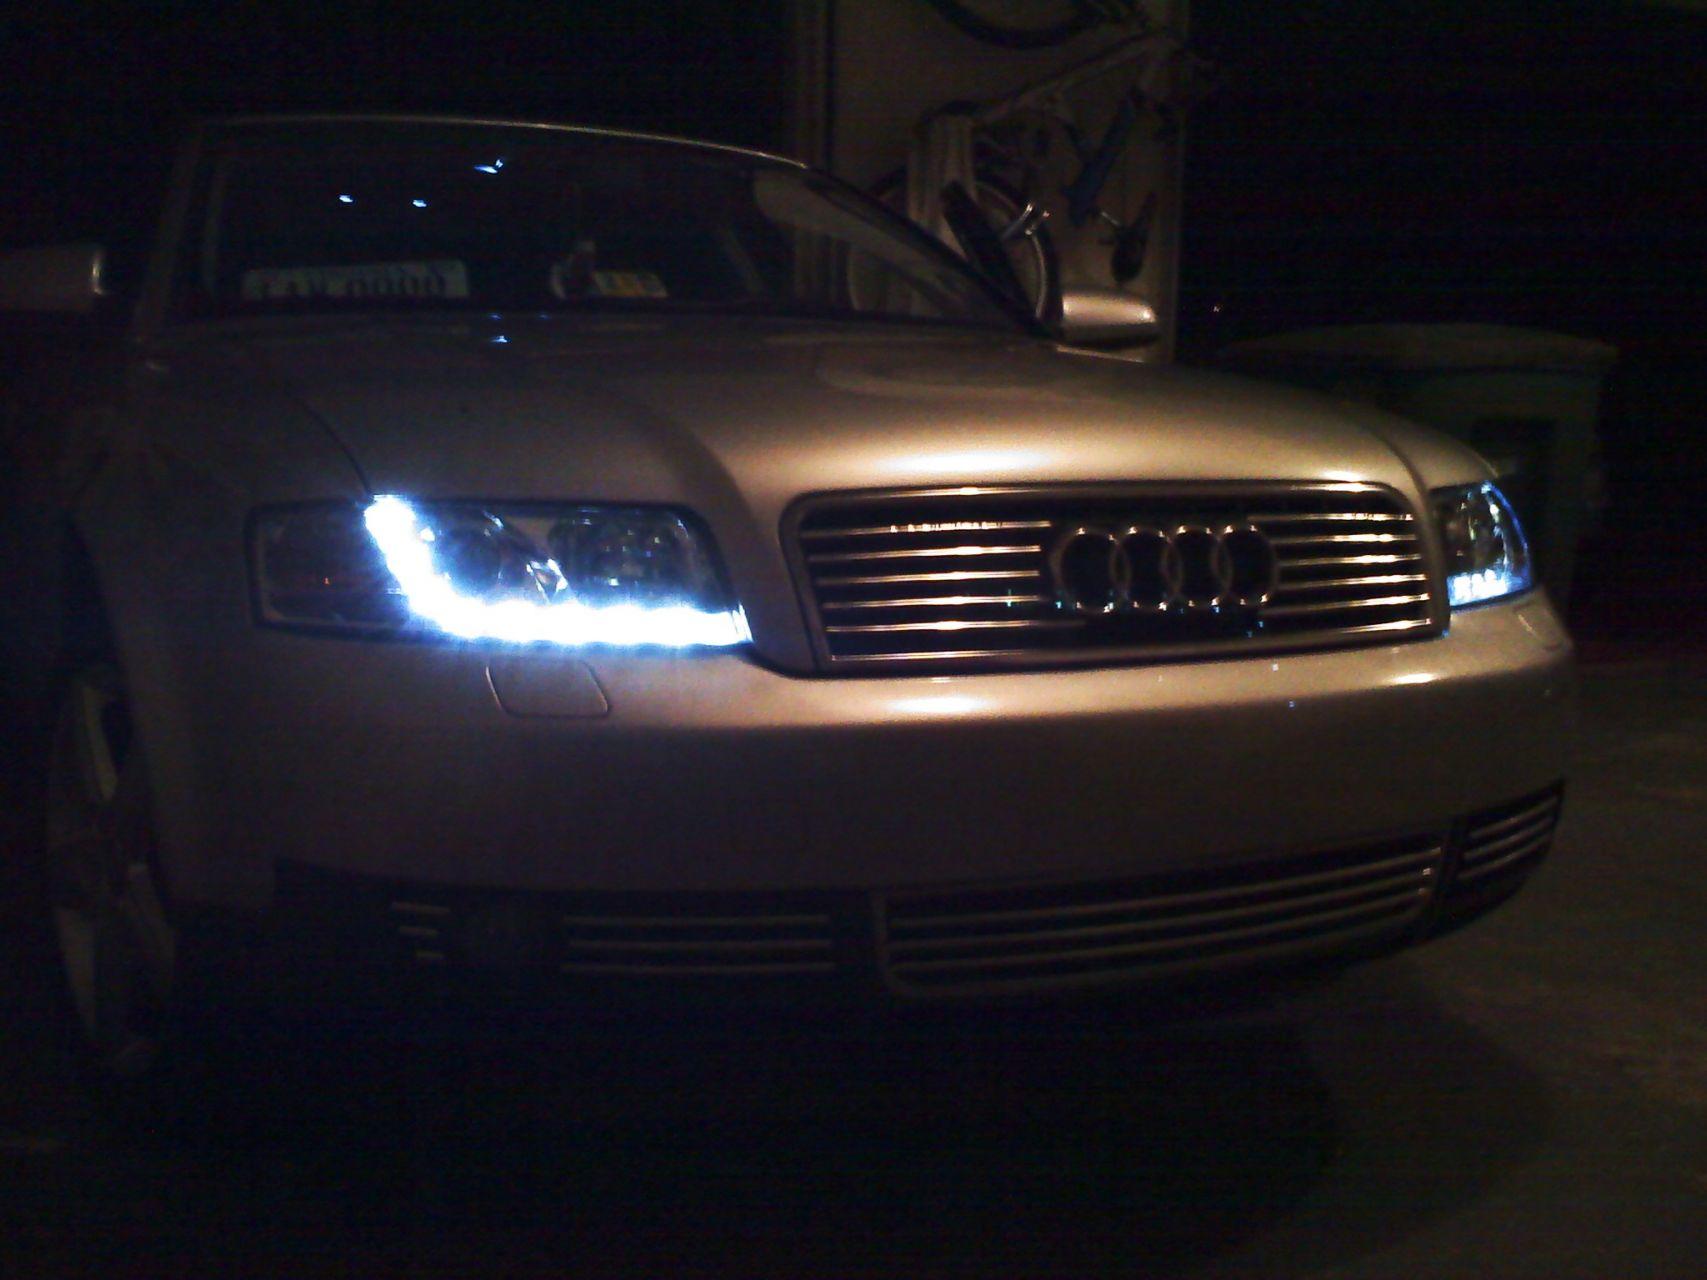 2006 Audi A3 Headlights Sportback By